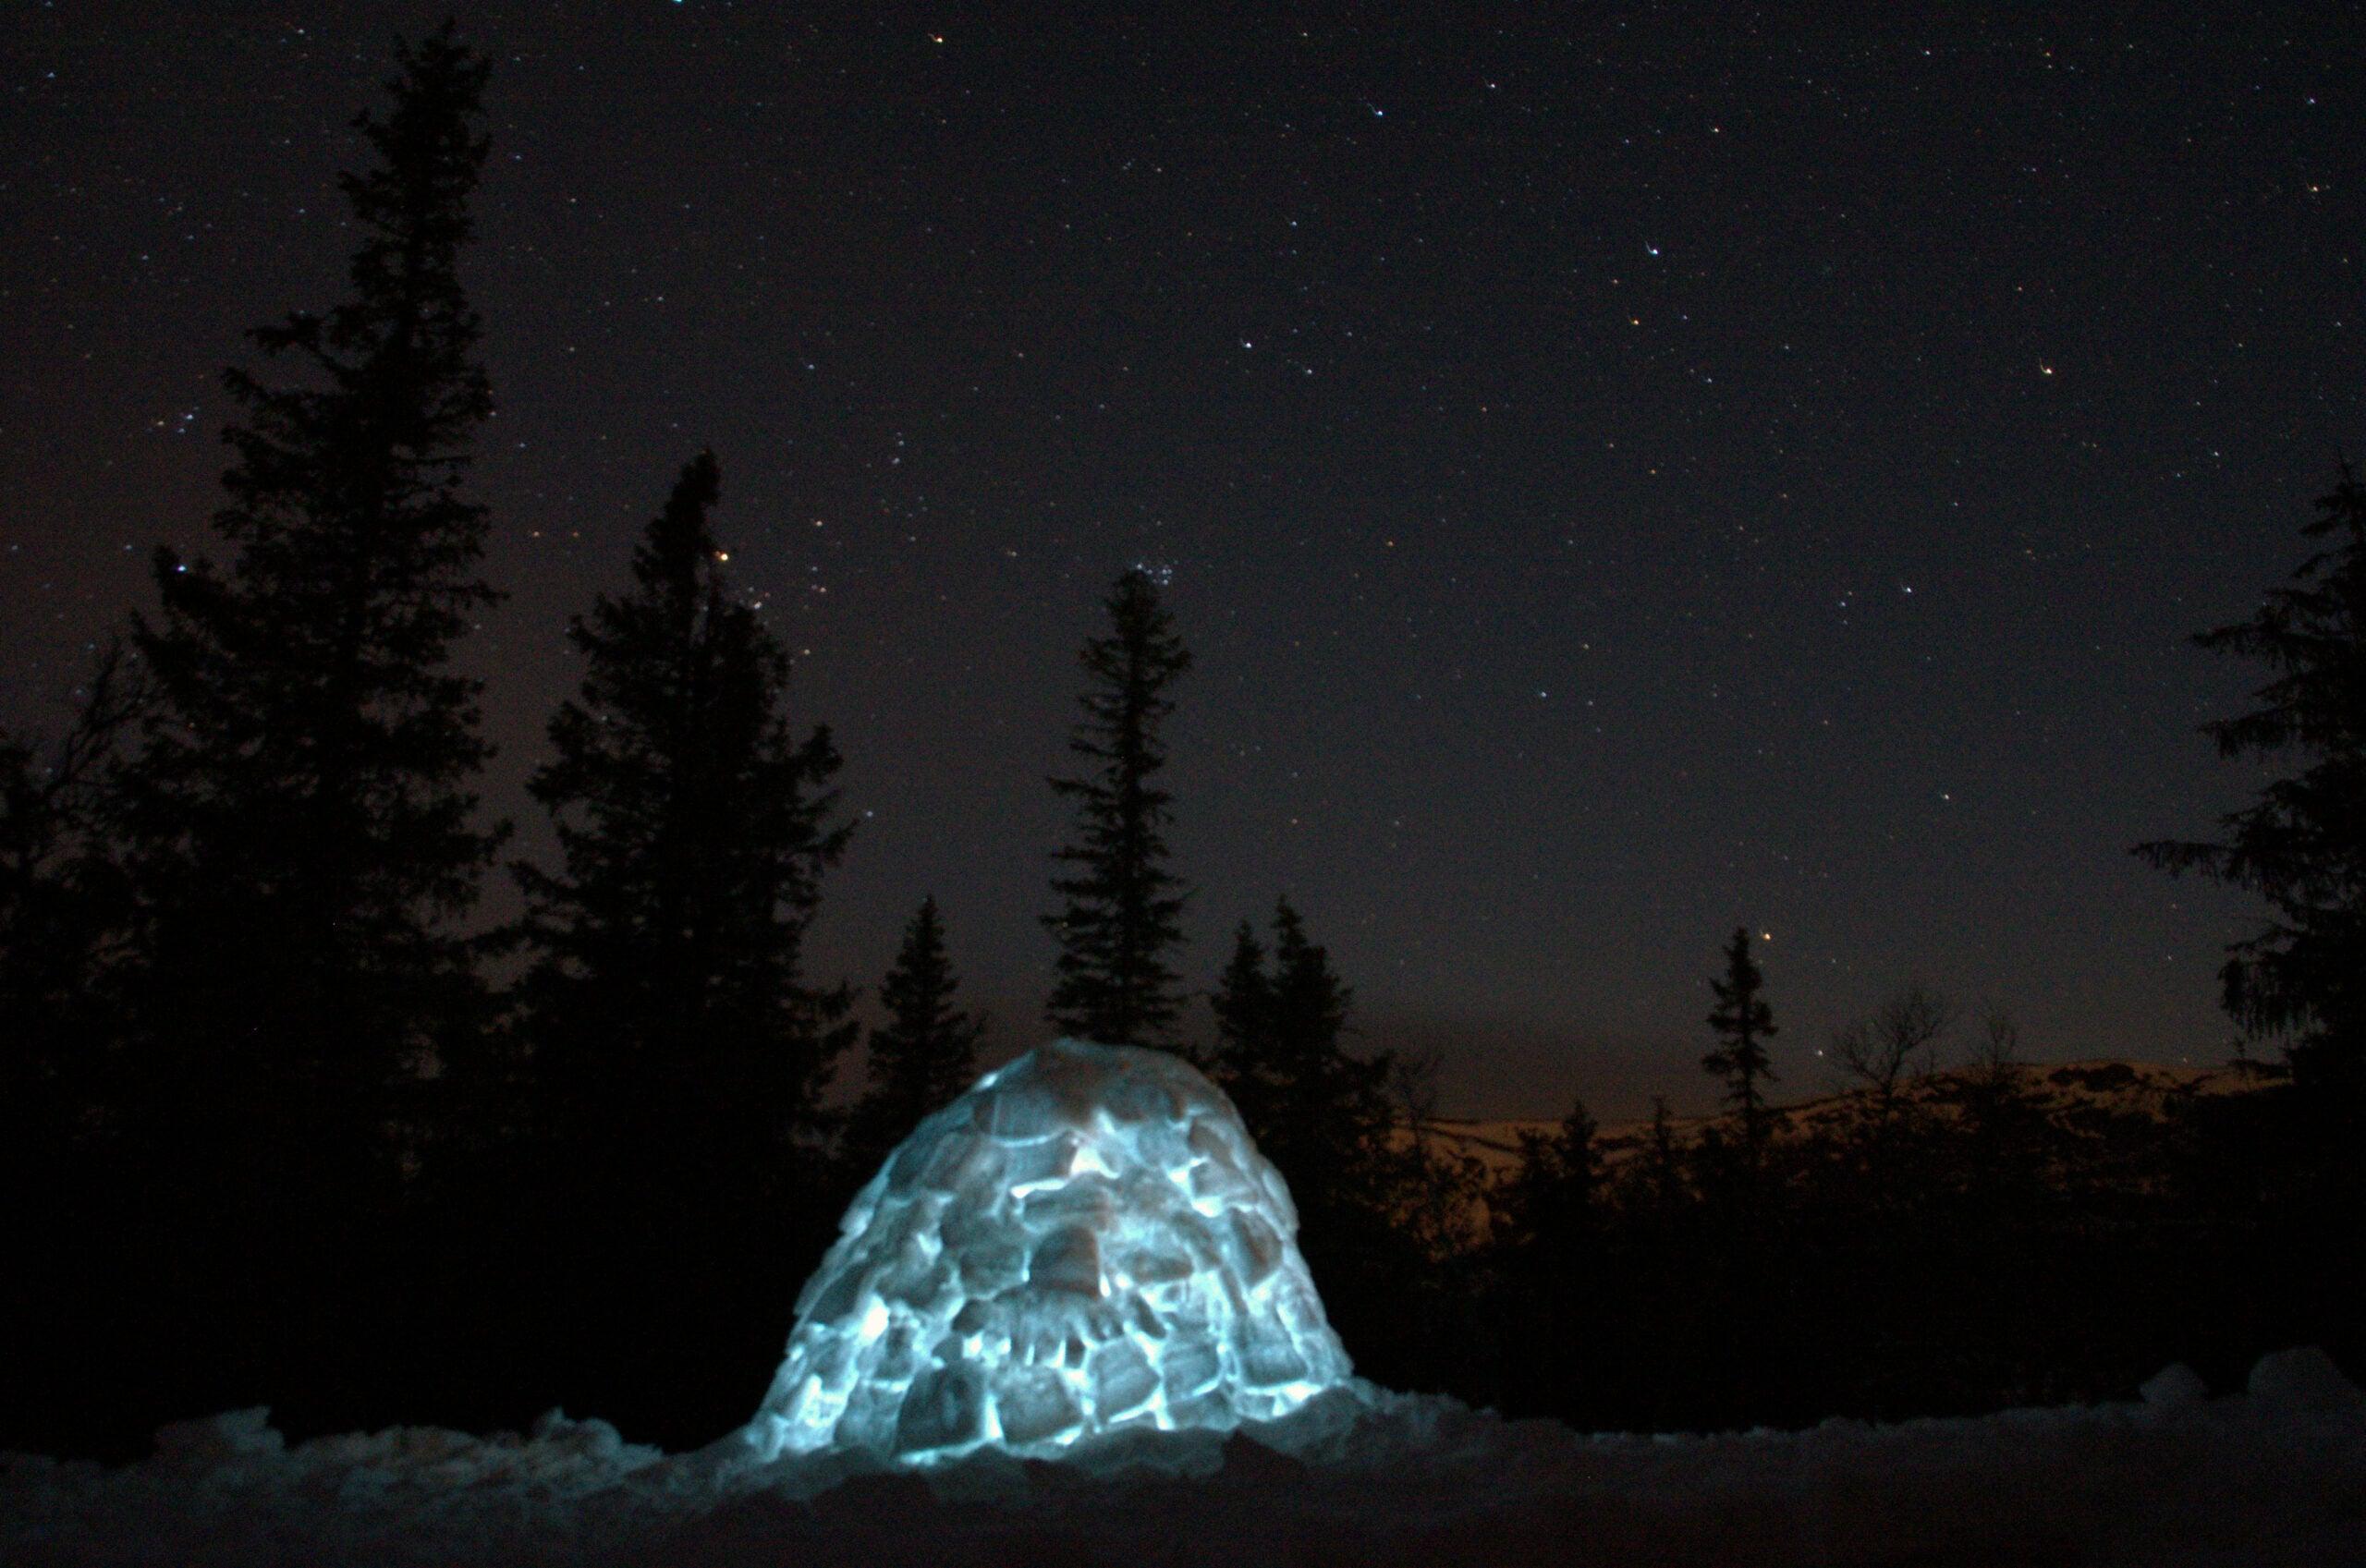 A lit-up igloo under a starry night sky